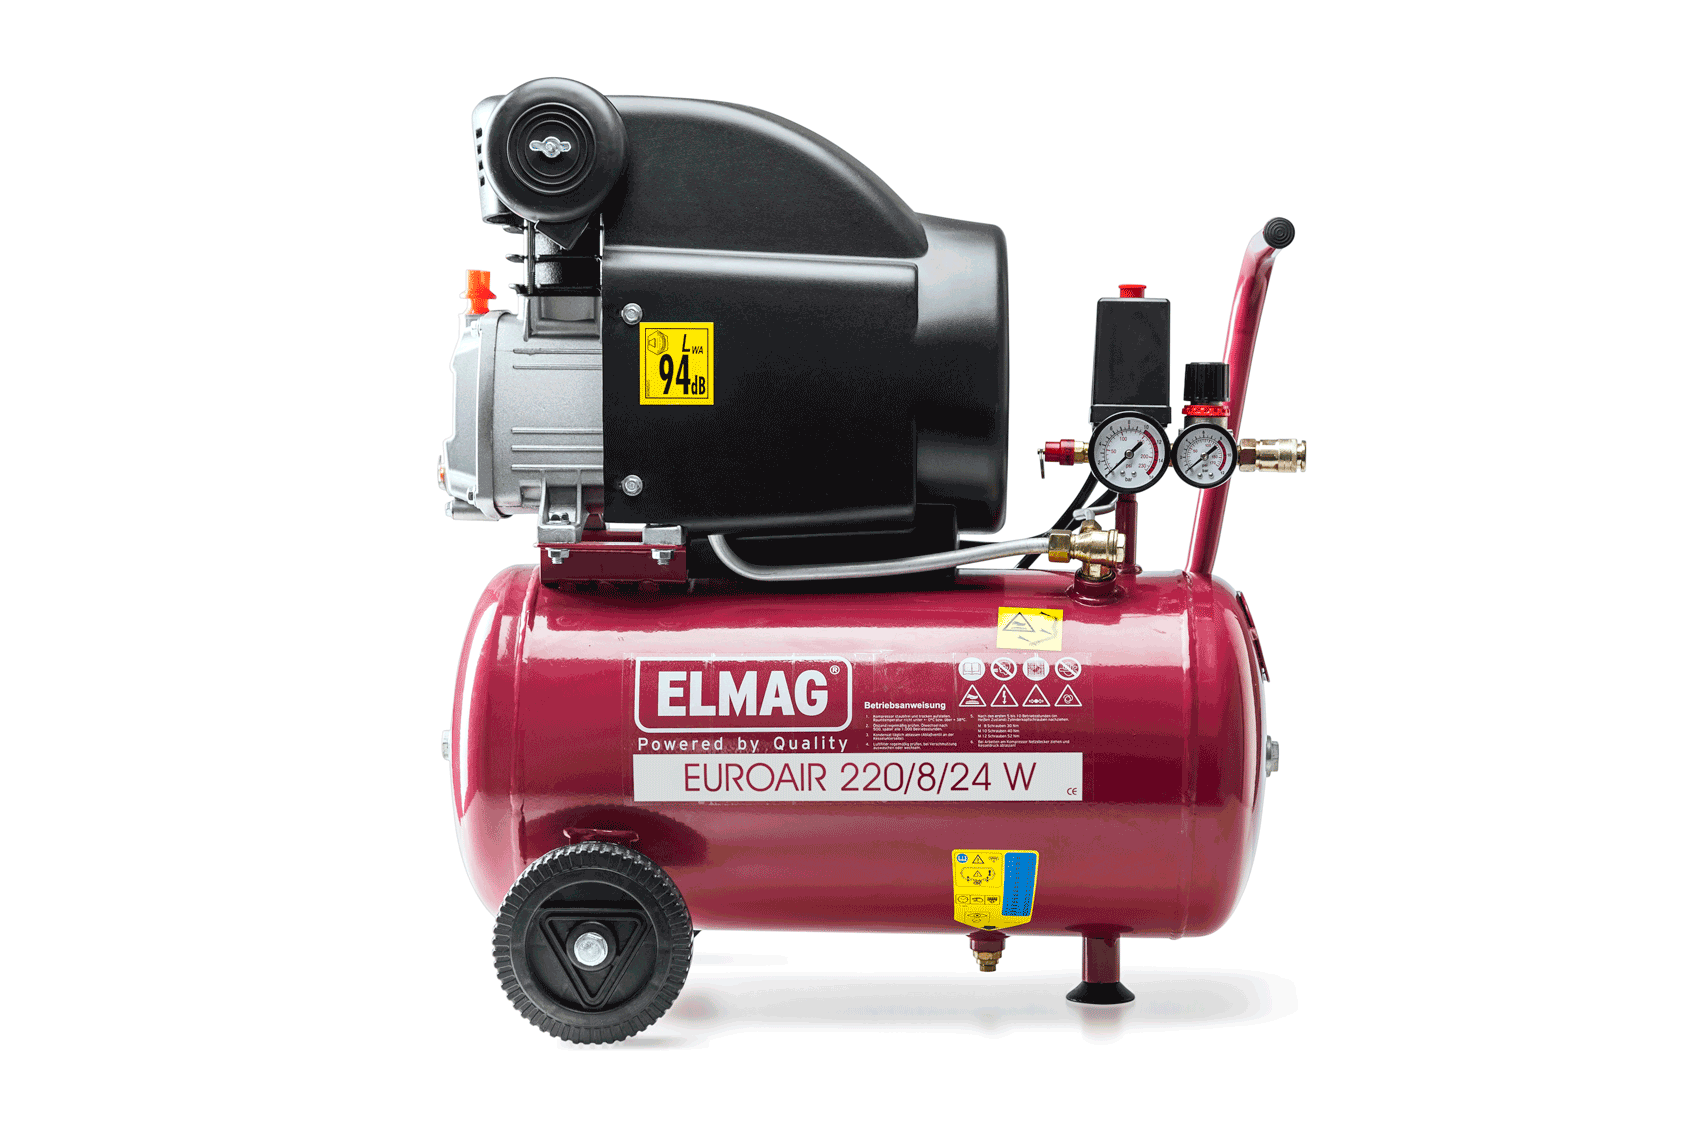 Elmag Kompressor EUROAIR 220/8/24 W